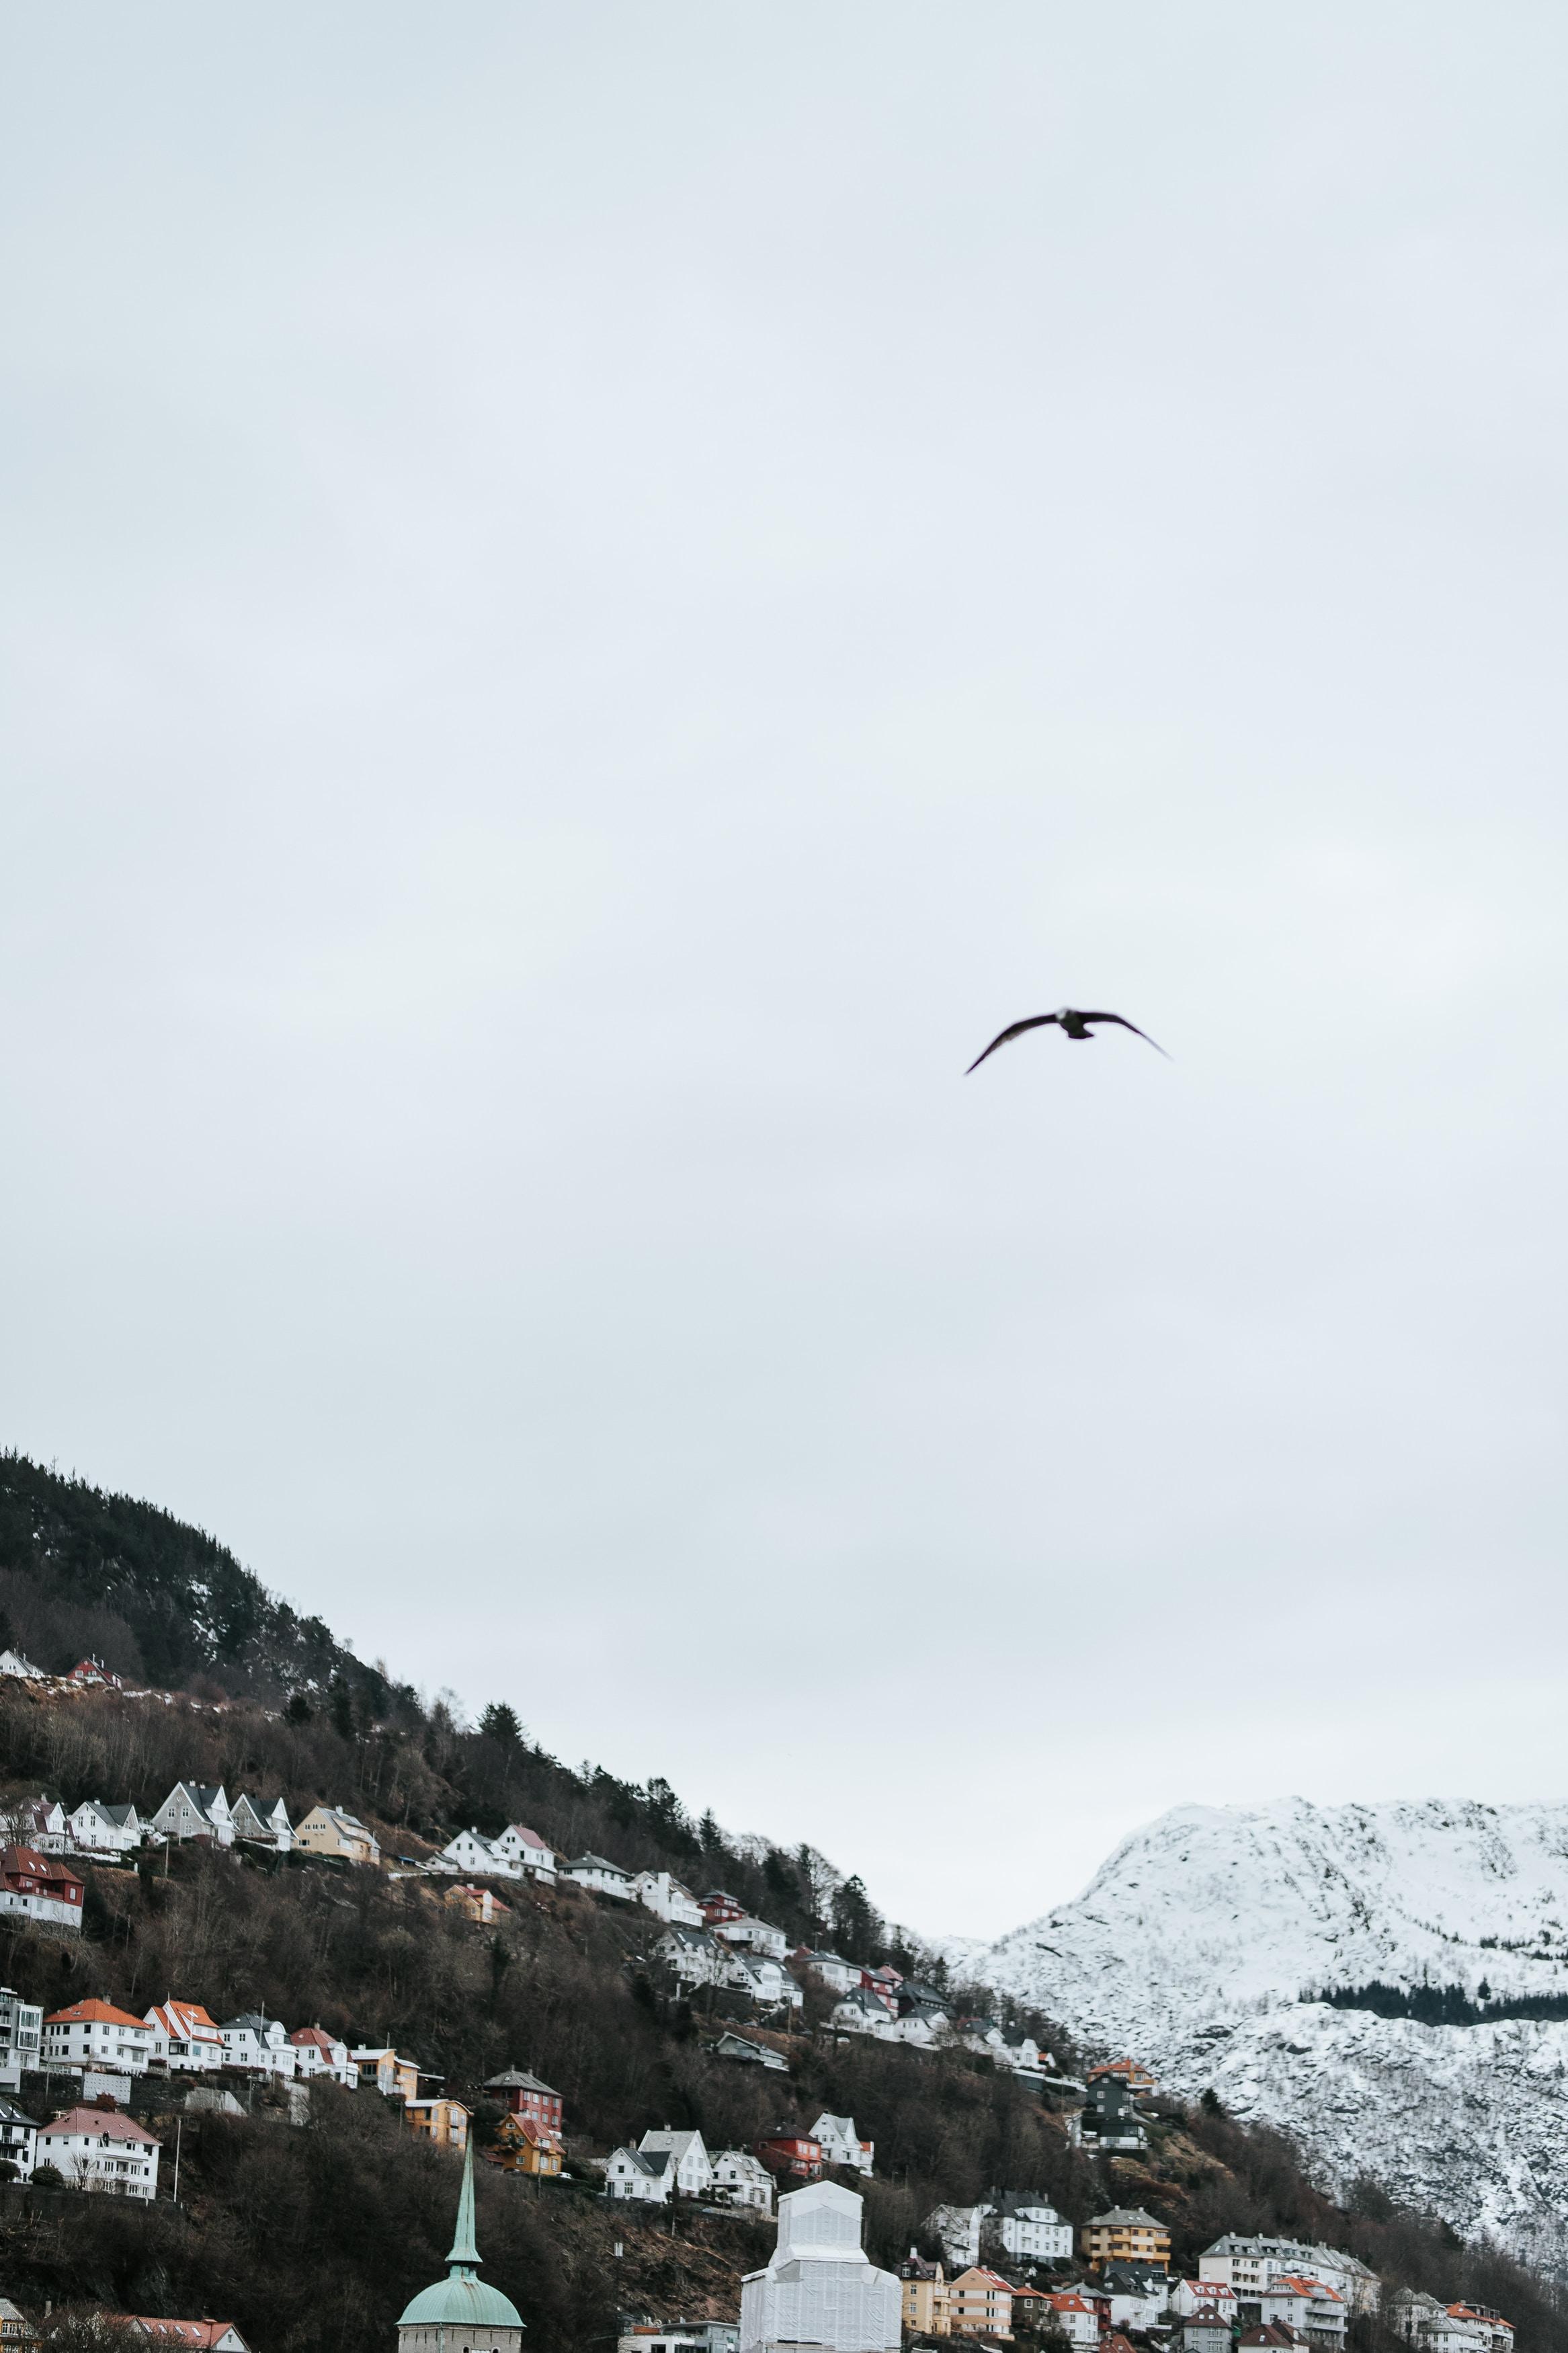 bird flying over village under cloudy sky